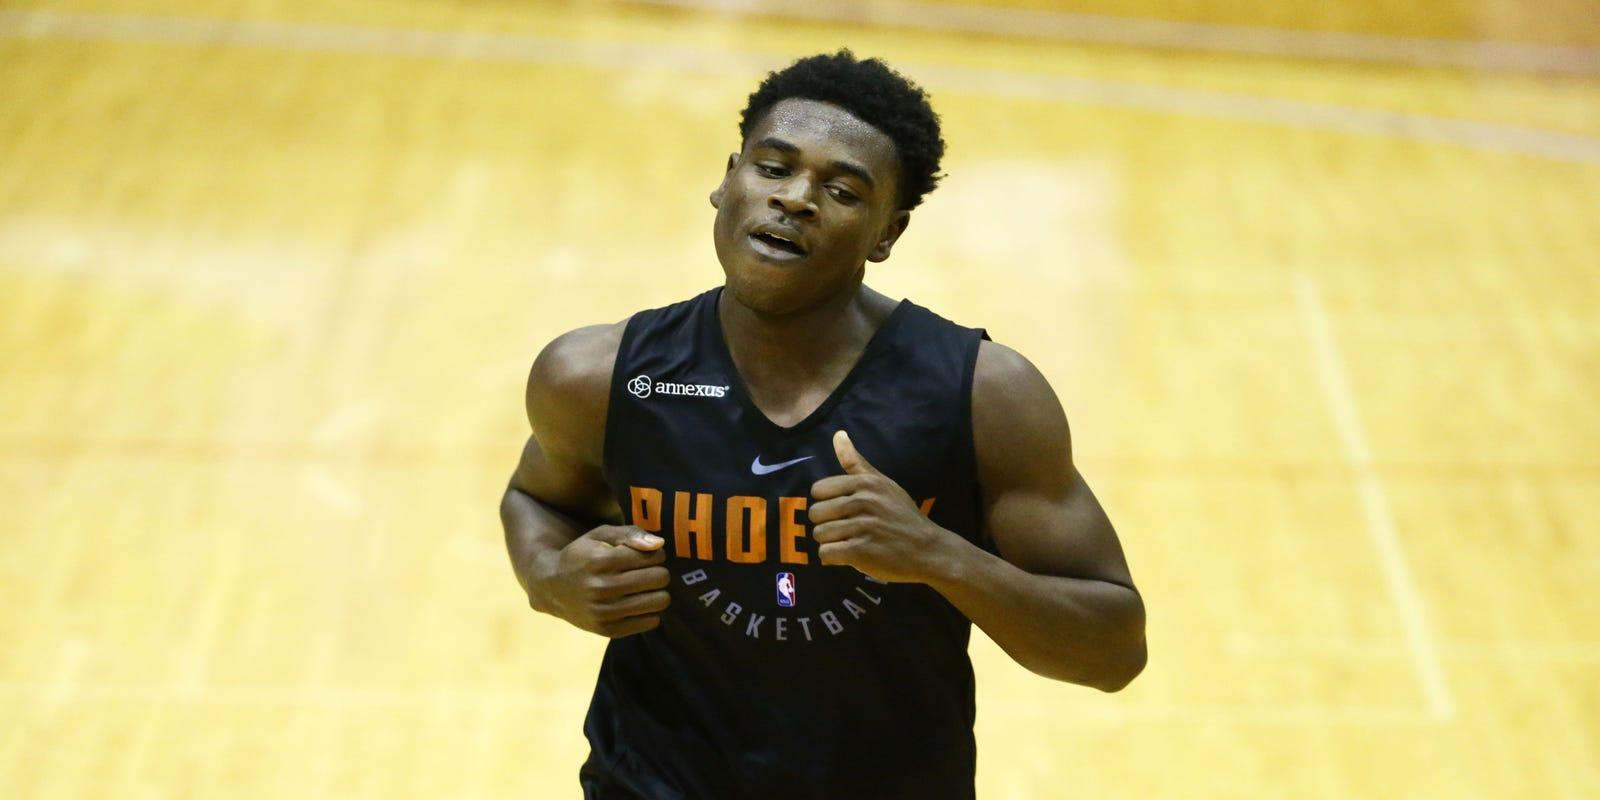 9b1ef7b34fc7 NBA mock draft  Suns select Deandre Ayton